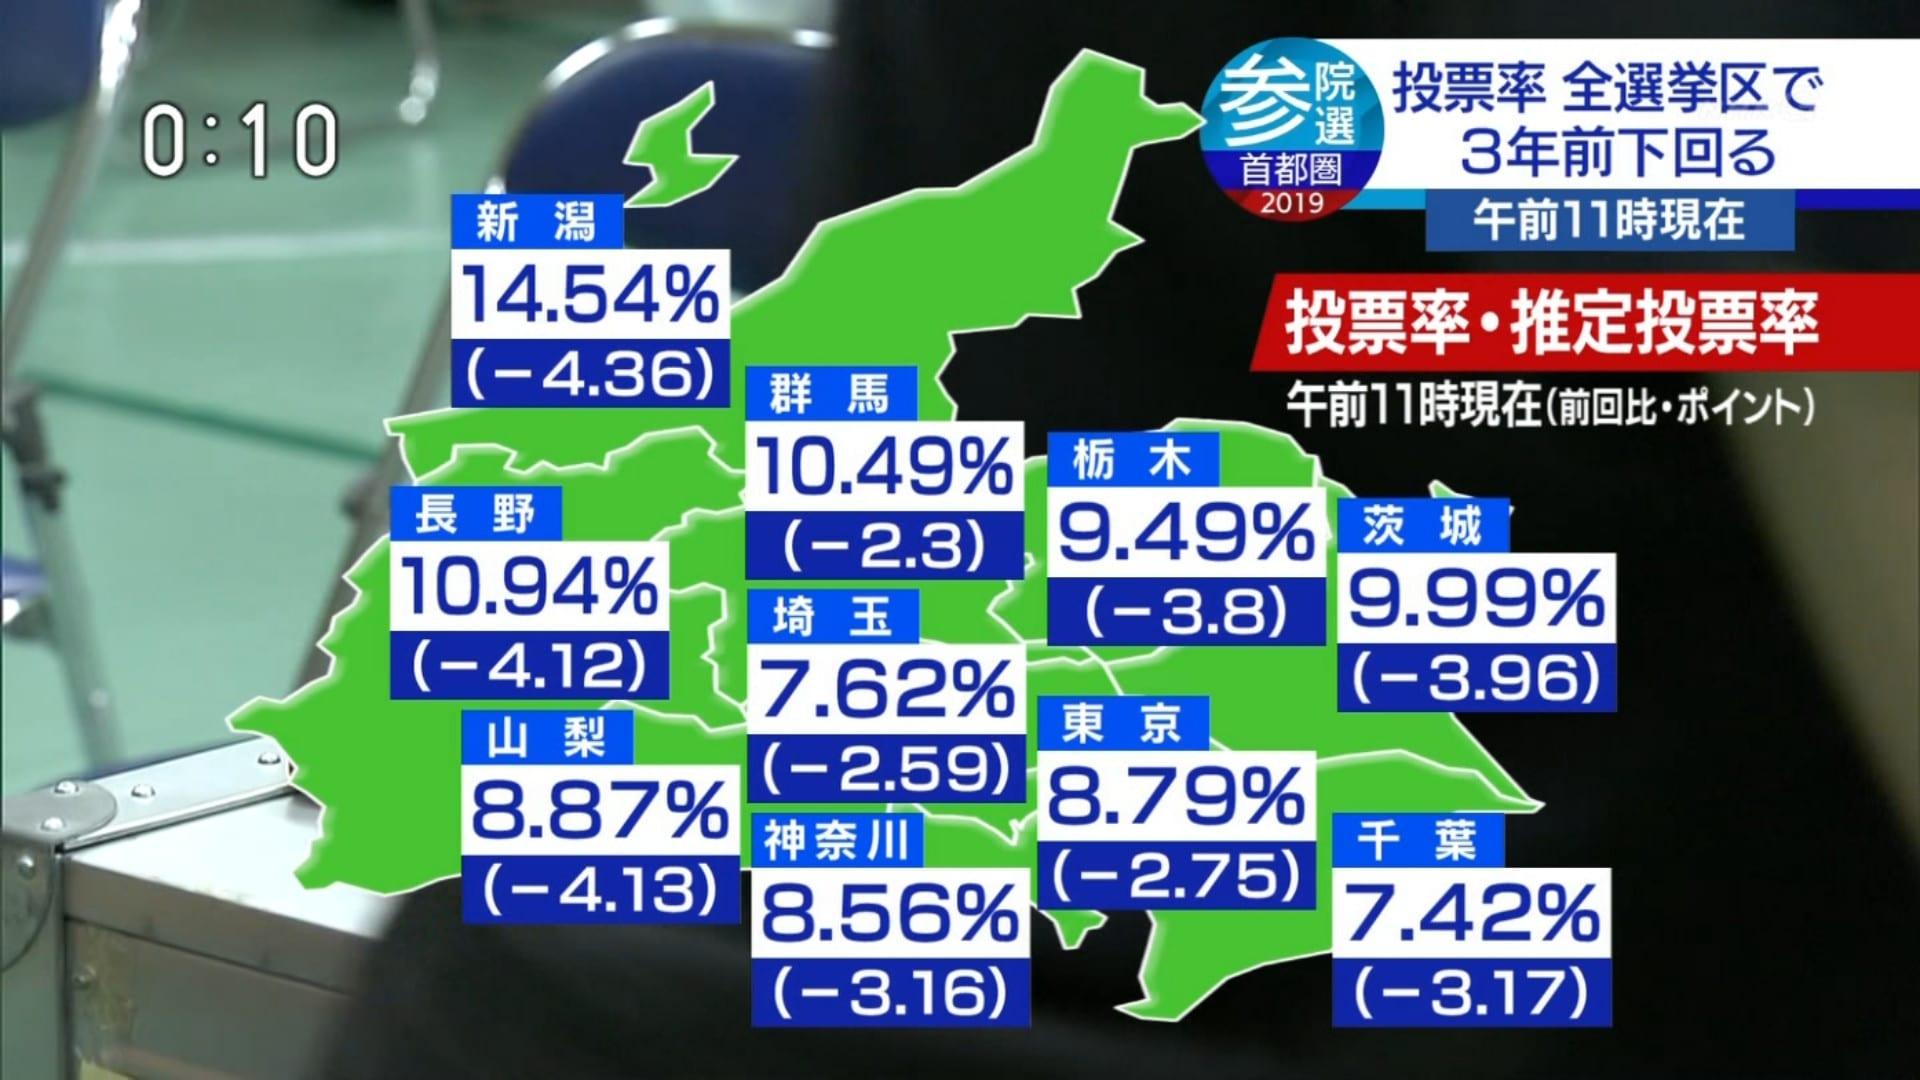 【悲報】 投票率ガチのマジで低すぎる。日本終わるwwwwwwwwwwwwwwww